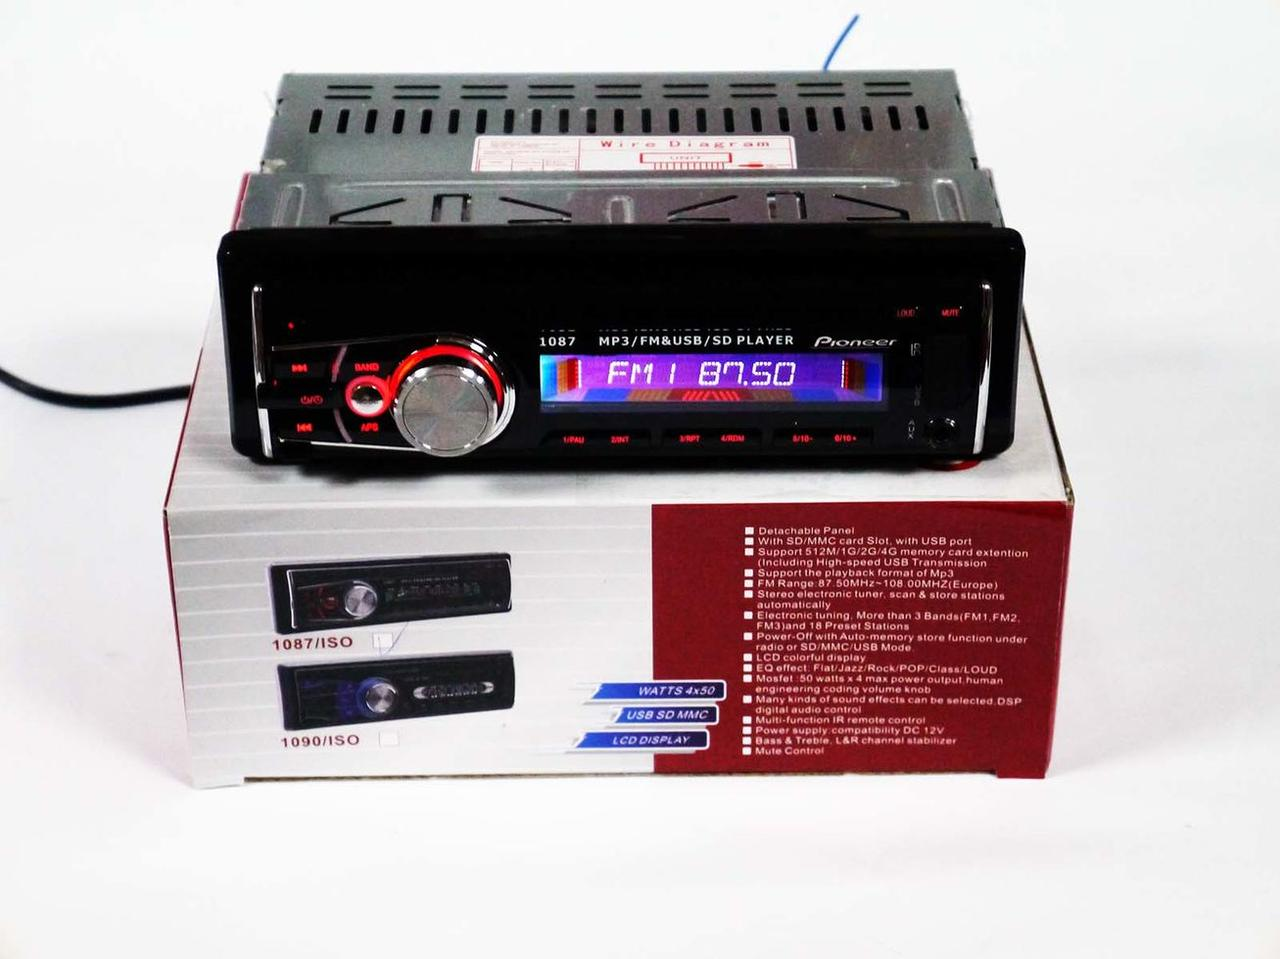 Автомагнитола Pioneer 1087 съемная панель